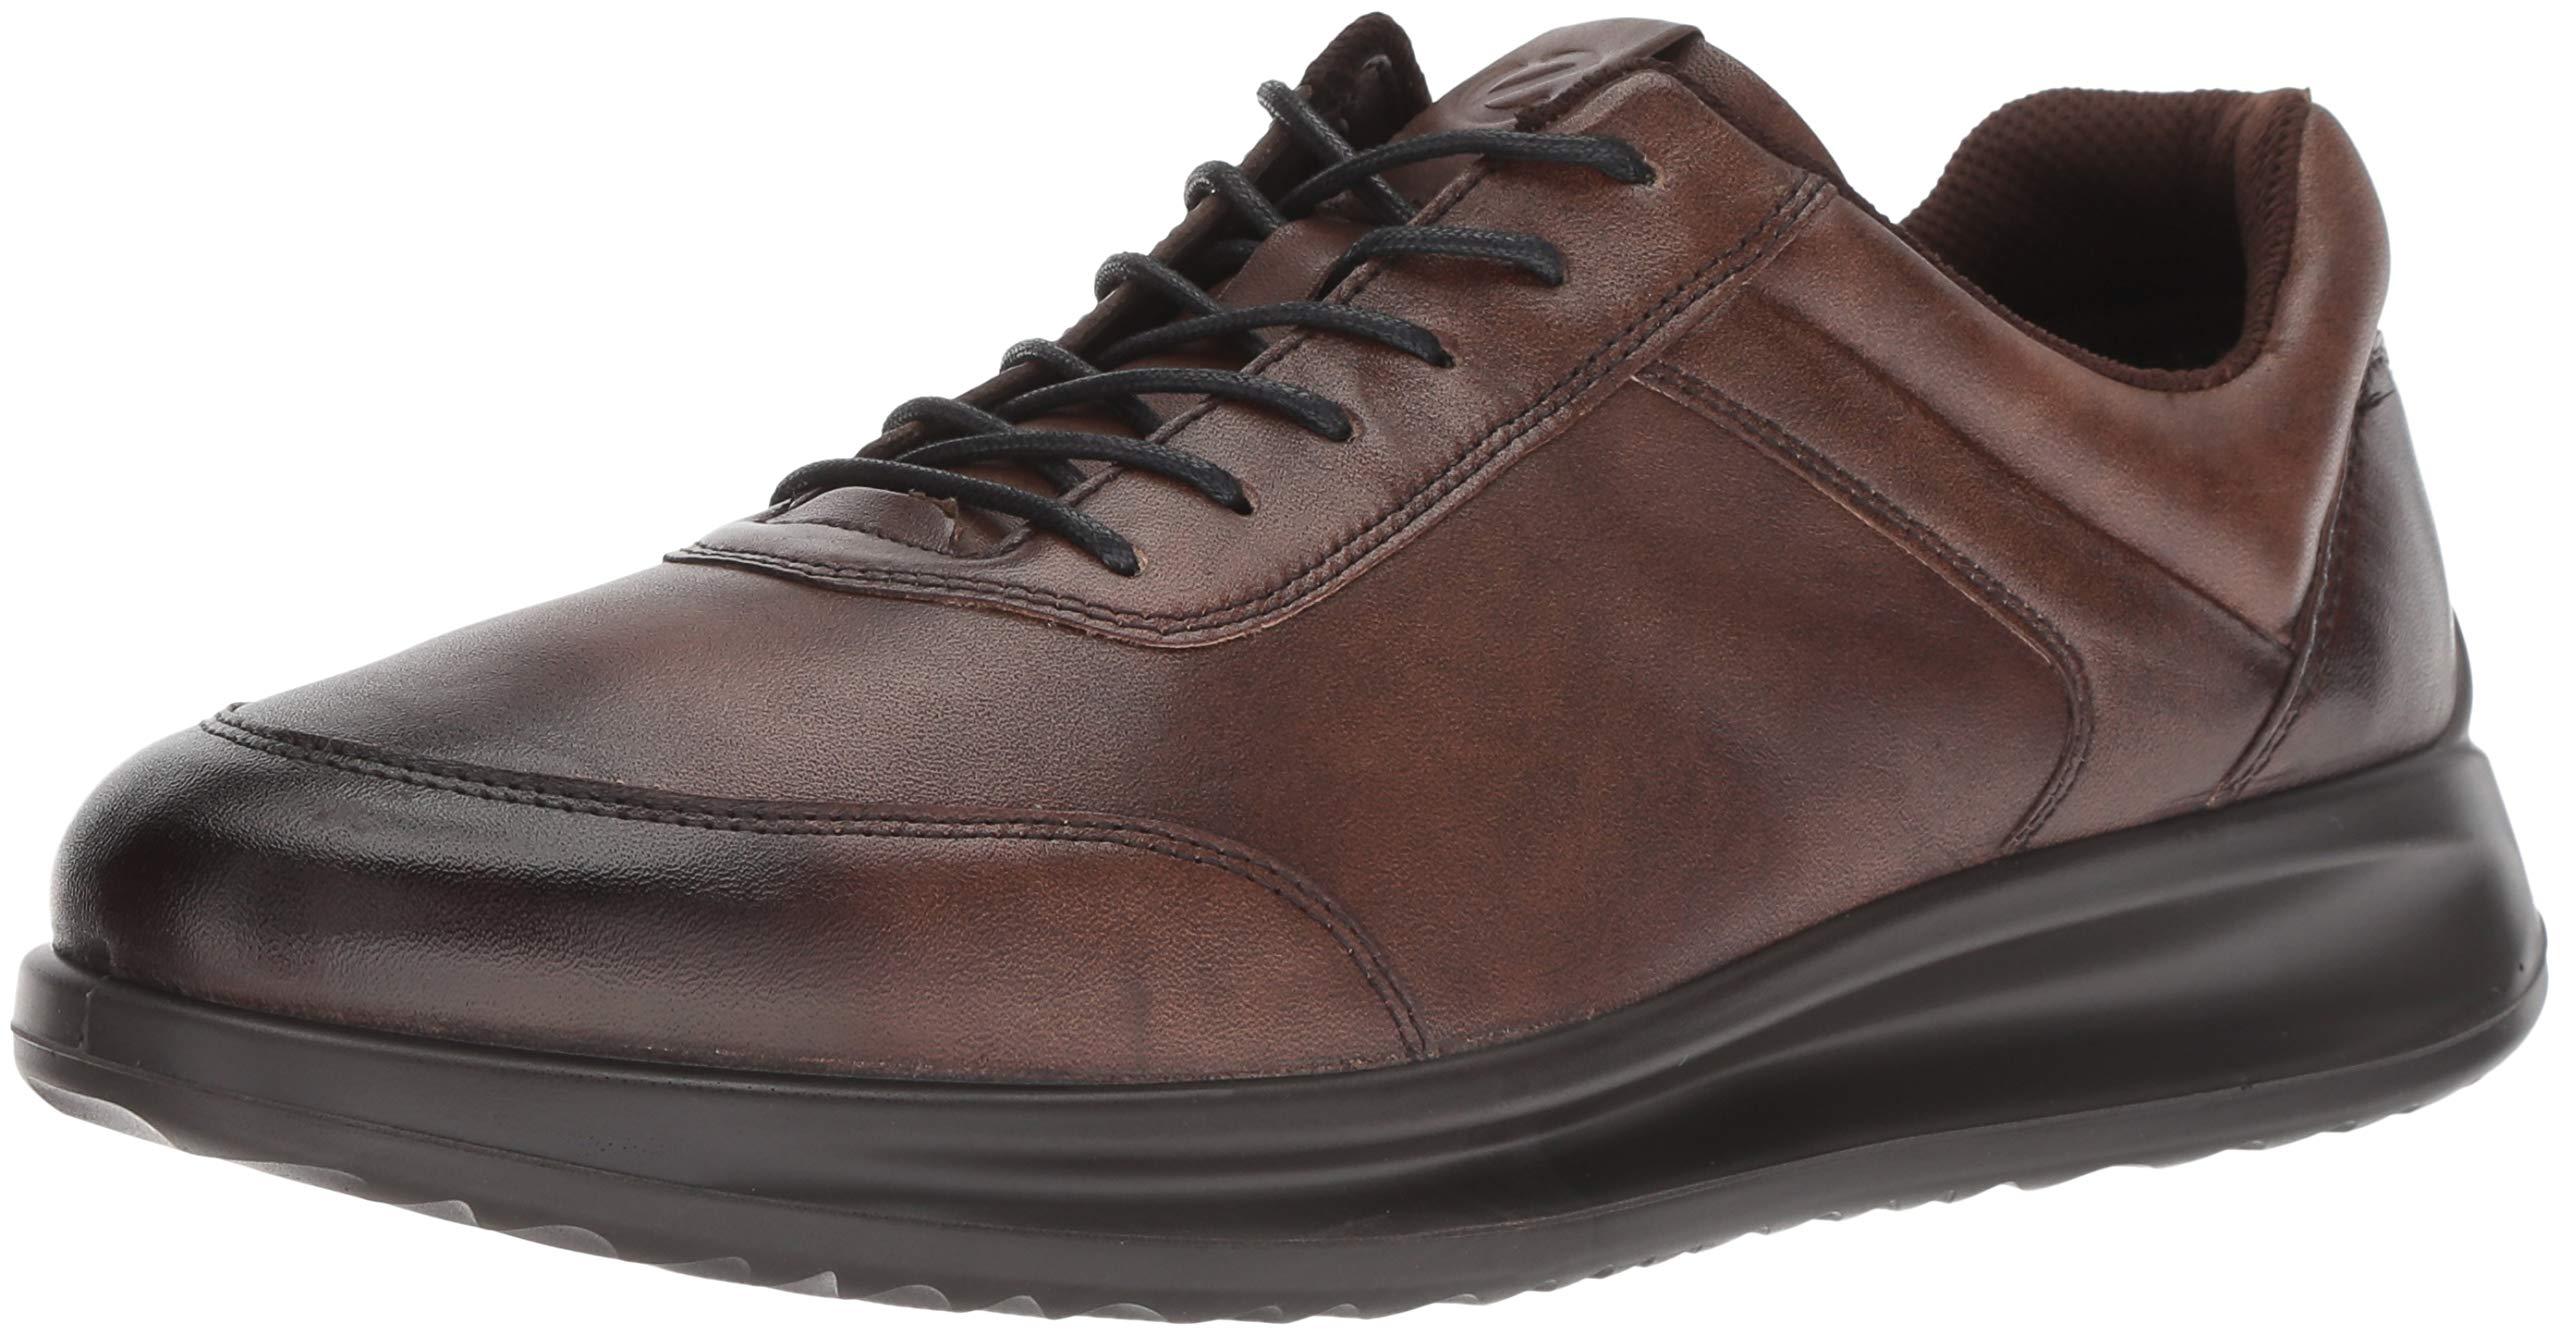 ECCO Men's Aquet Tie Oxford Cocoa Brown Sneaker 43 M EU (9-9.5 US)